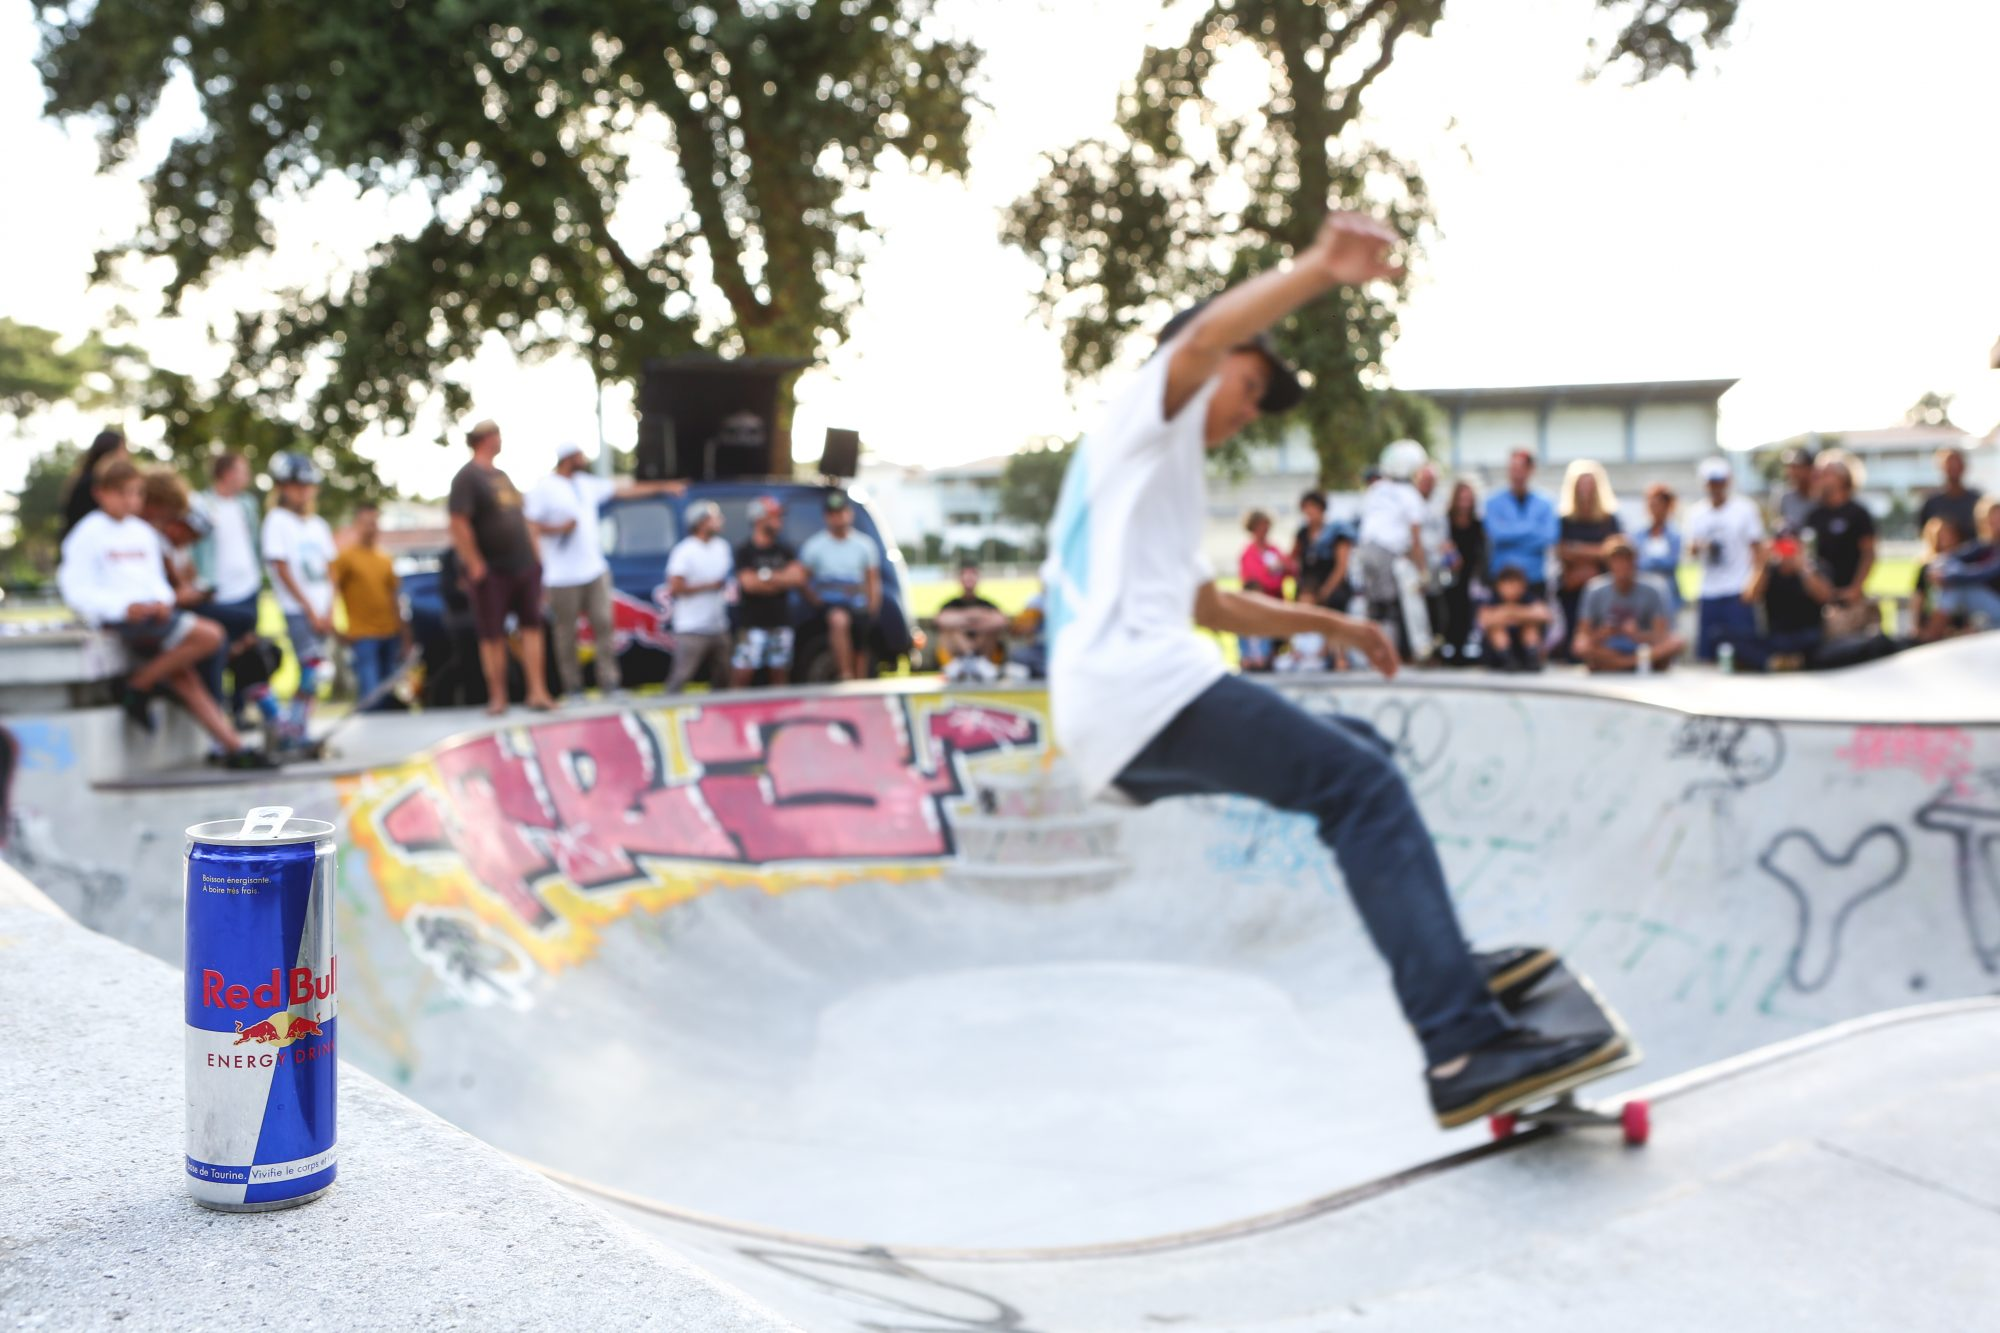 capbreton skatepark